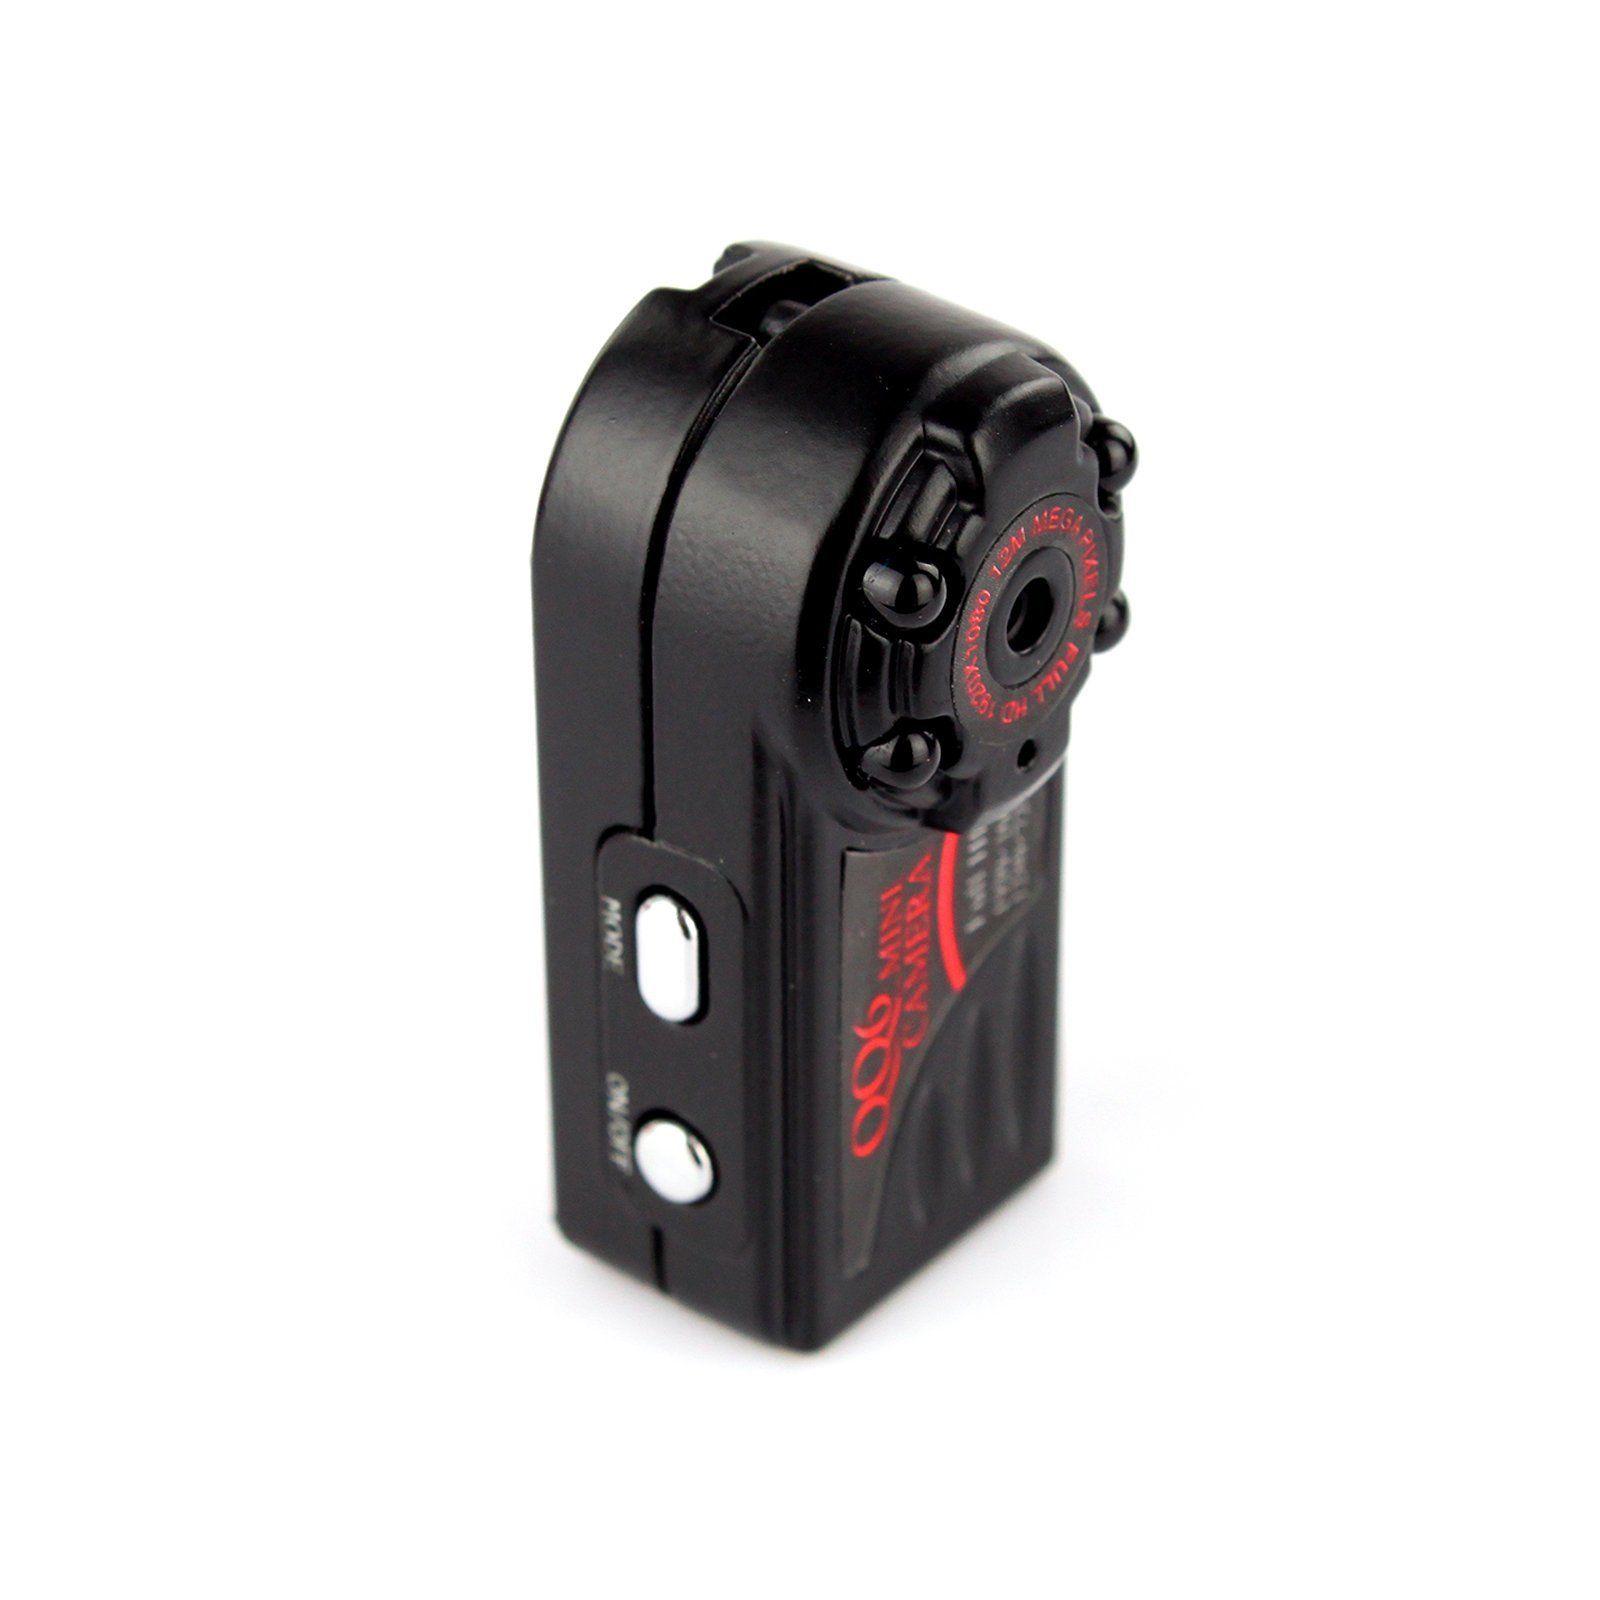 32GB Card+QQ6 Mini DV Full HD 1080P Digital Car Video Recorder Thumb Metal Mini Camera lc 08 mini dv headphone 1080p hd sport dv bluetooth headset stereo neck strap video recorder